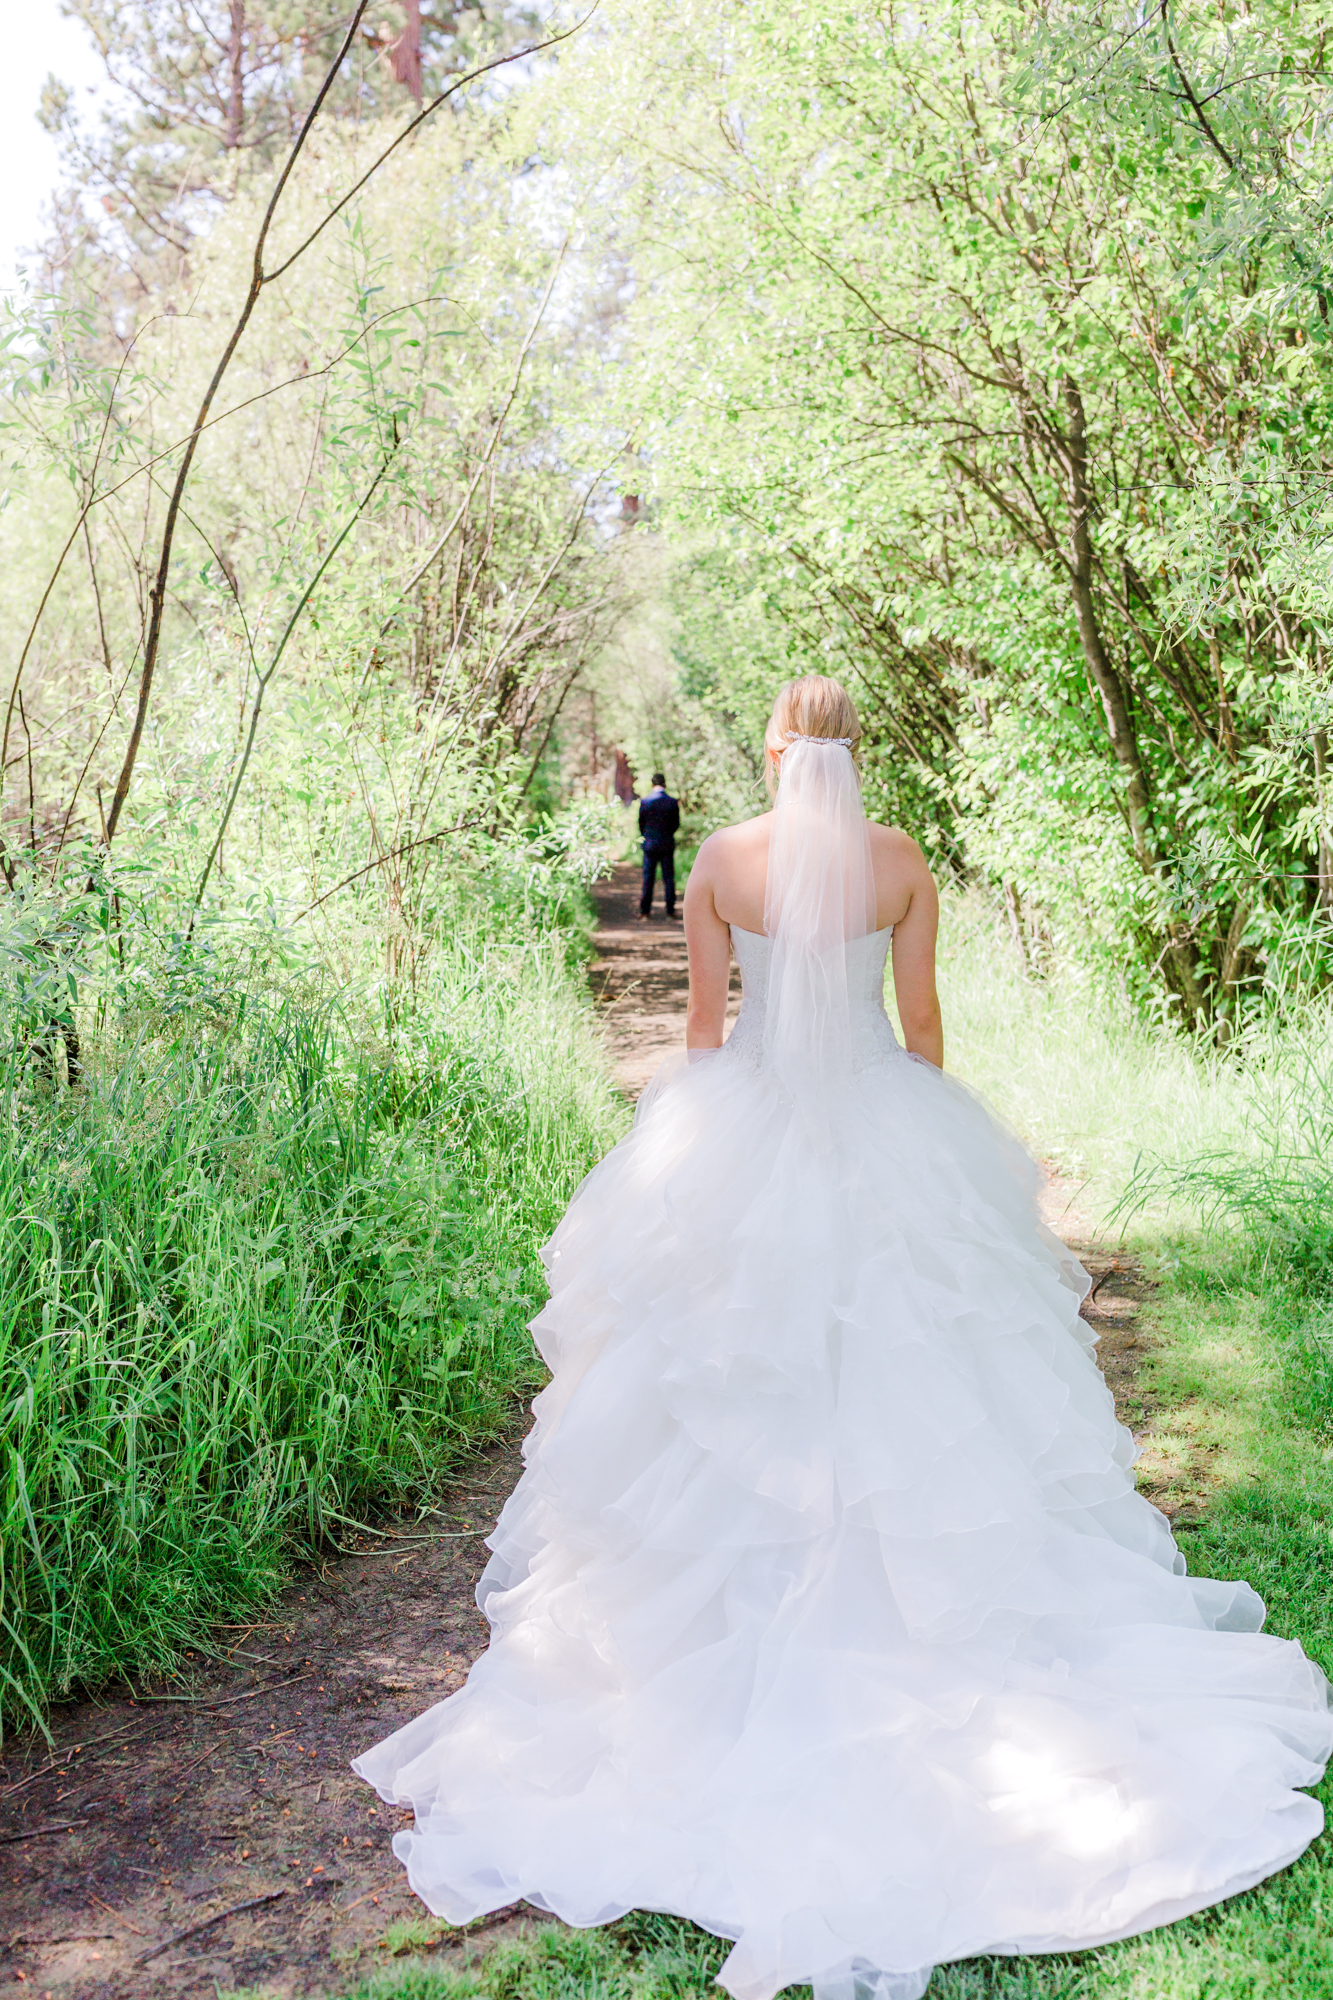 Wedding first look at Shevlin Park in Bend Oregon